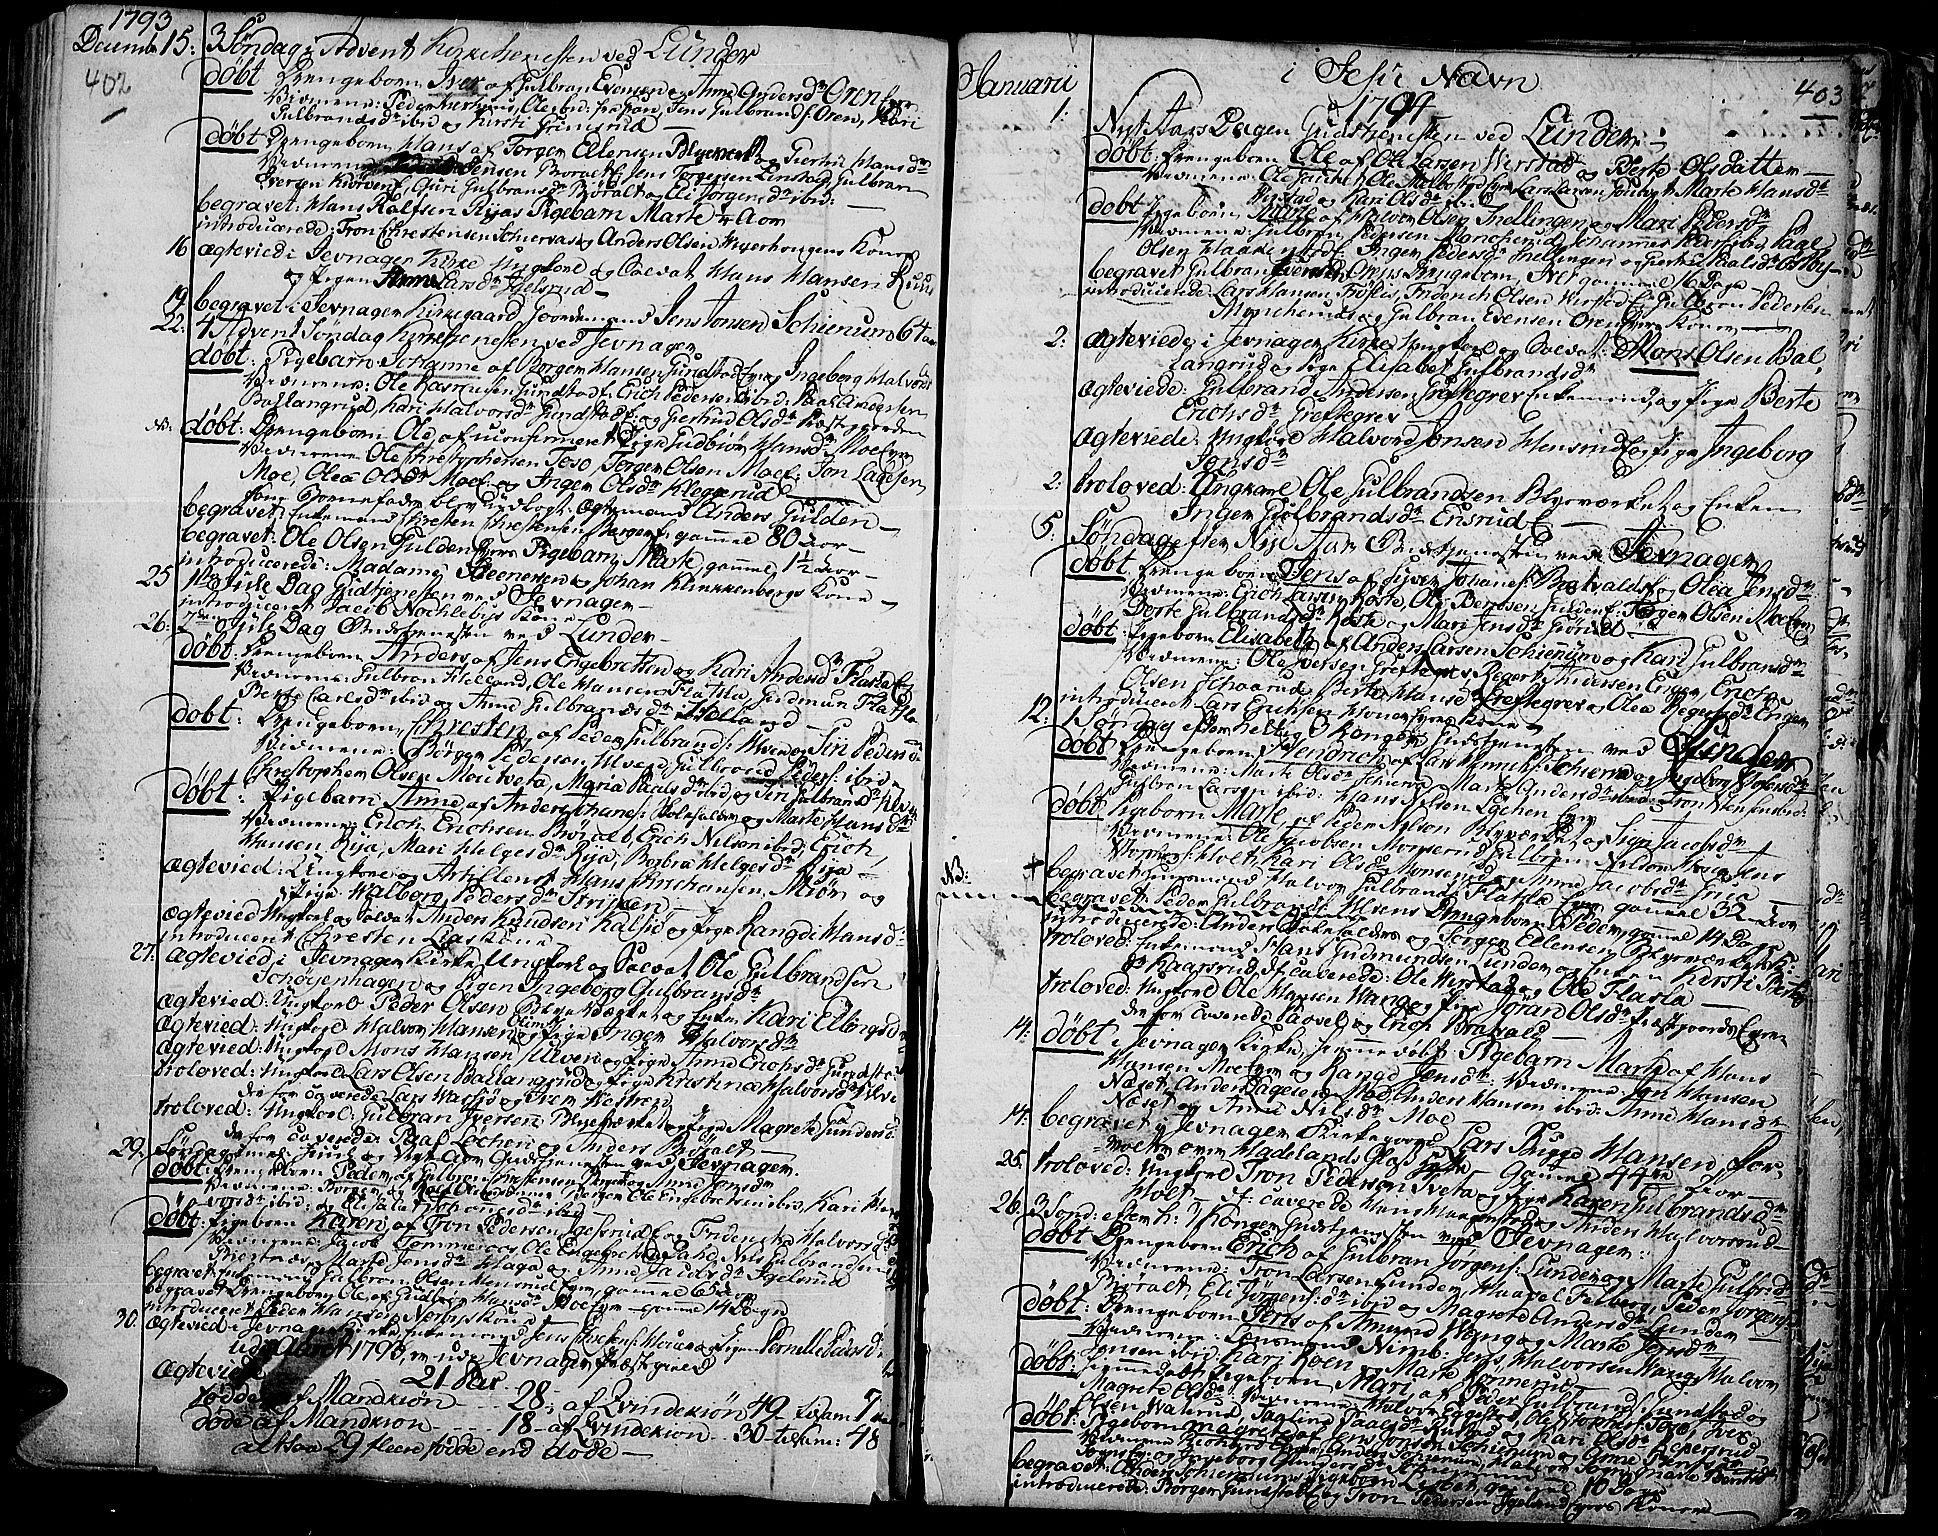 SAH, Jevnaker prestekontor, Ministerialbok nr. 3, 1752-1799, s. 402-403